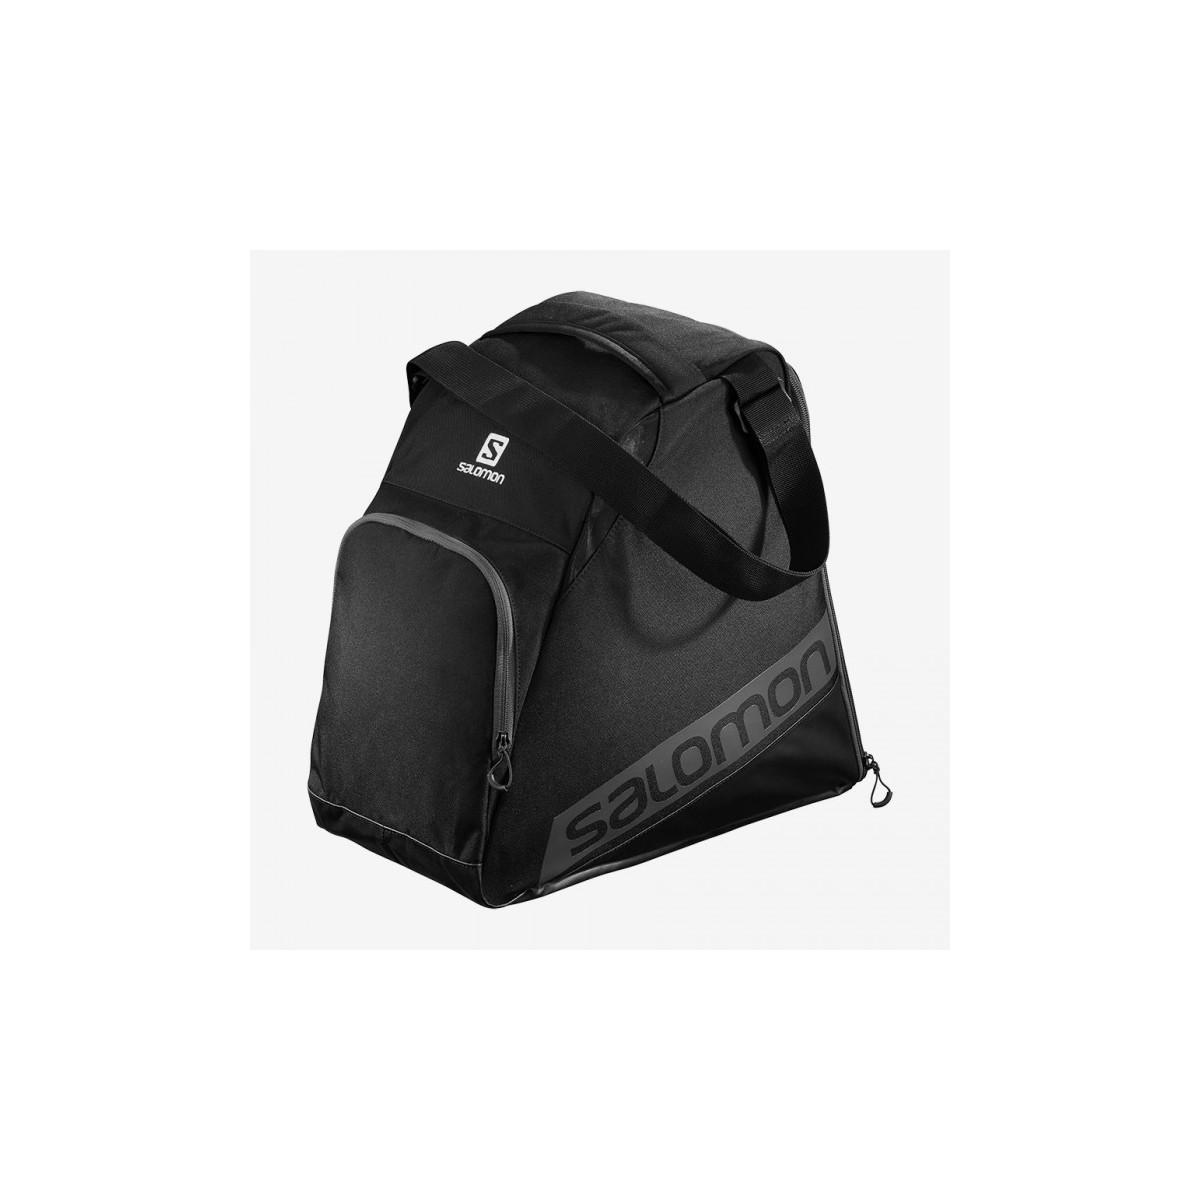 SALOMON boot bag EXTEND GEAR black